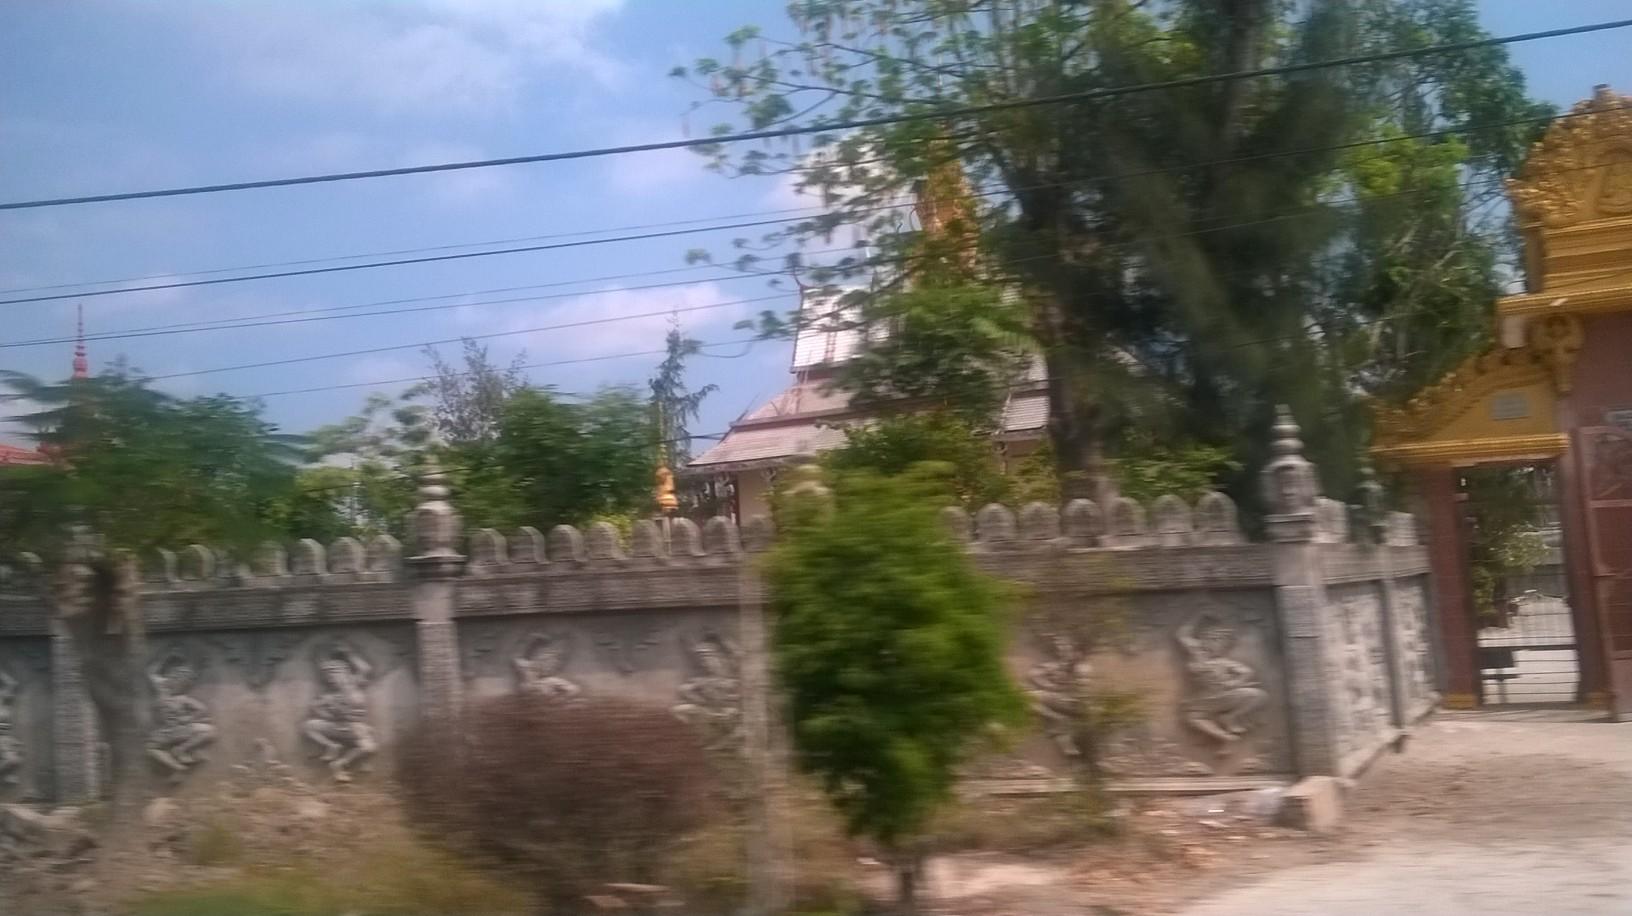 ca mau Monivongsa Bopharam Temple is a Khmer temple passing mar16